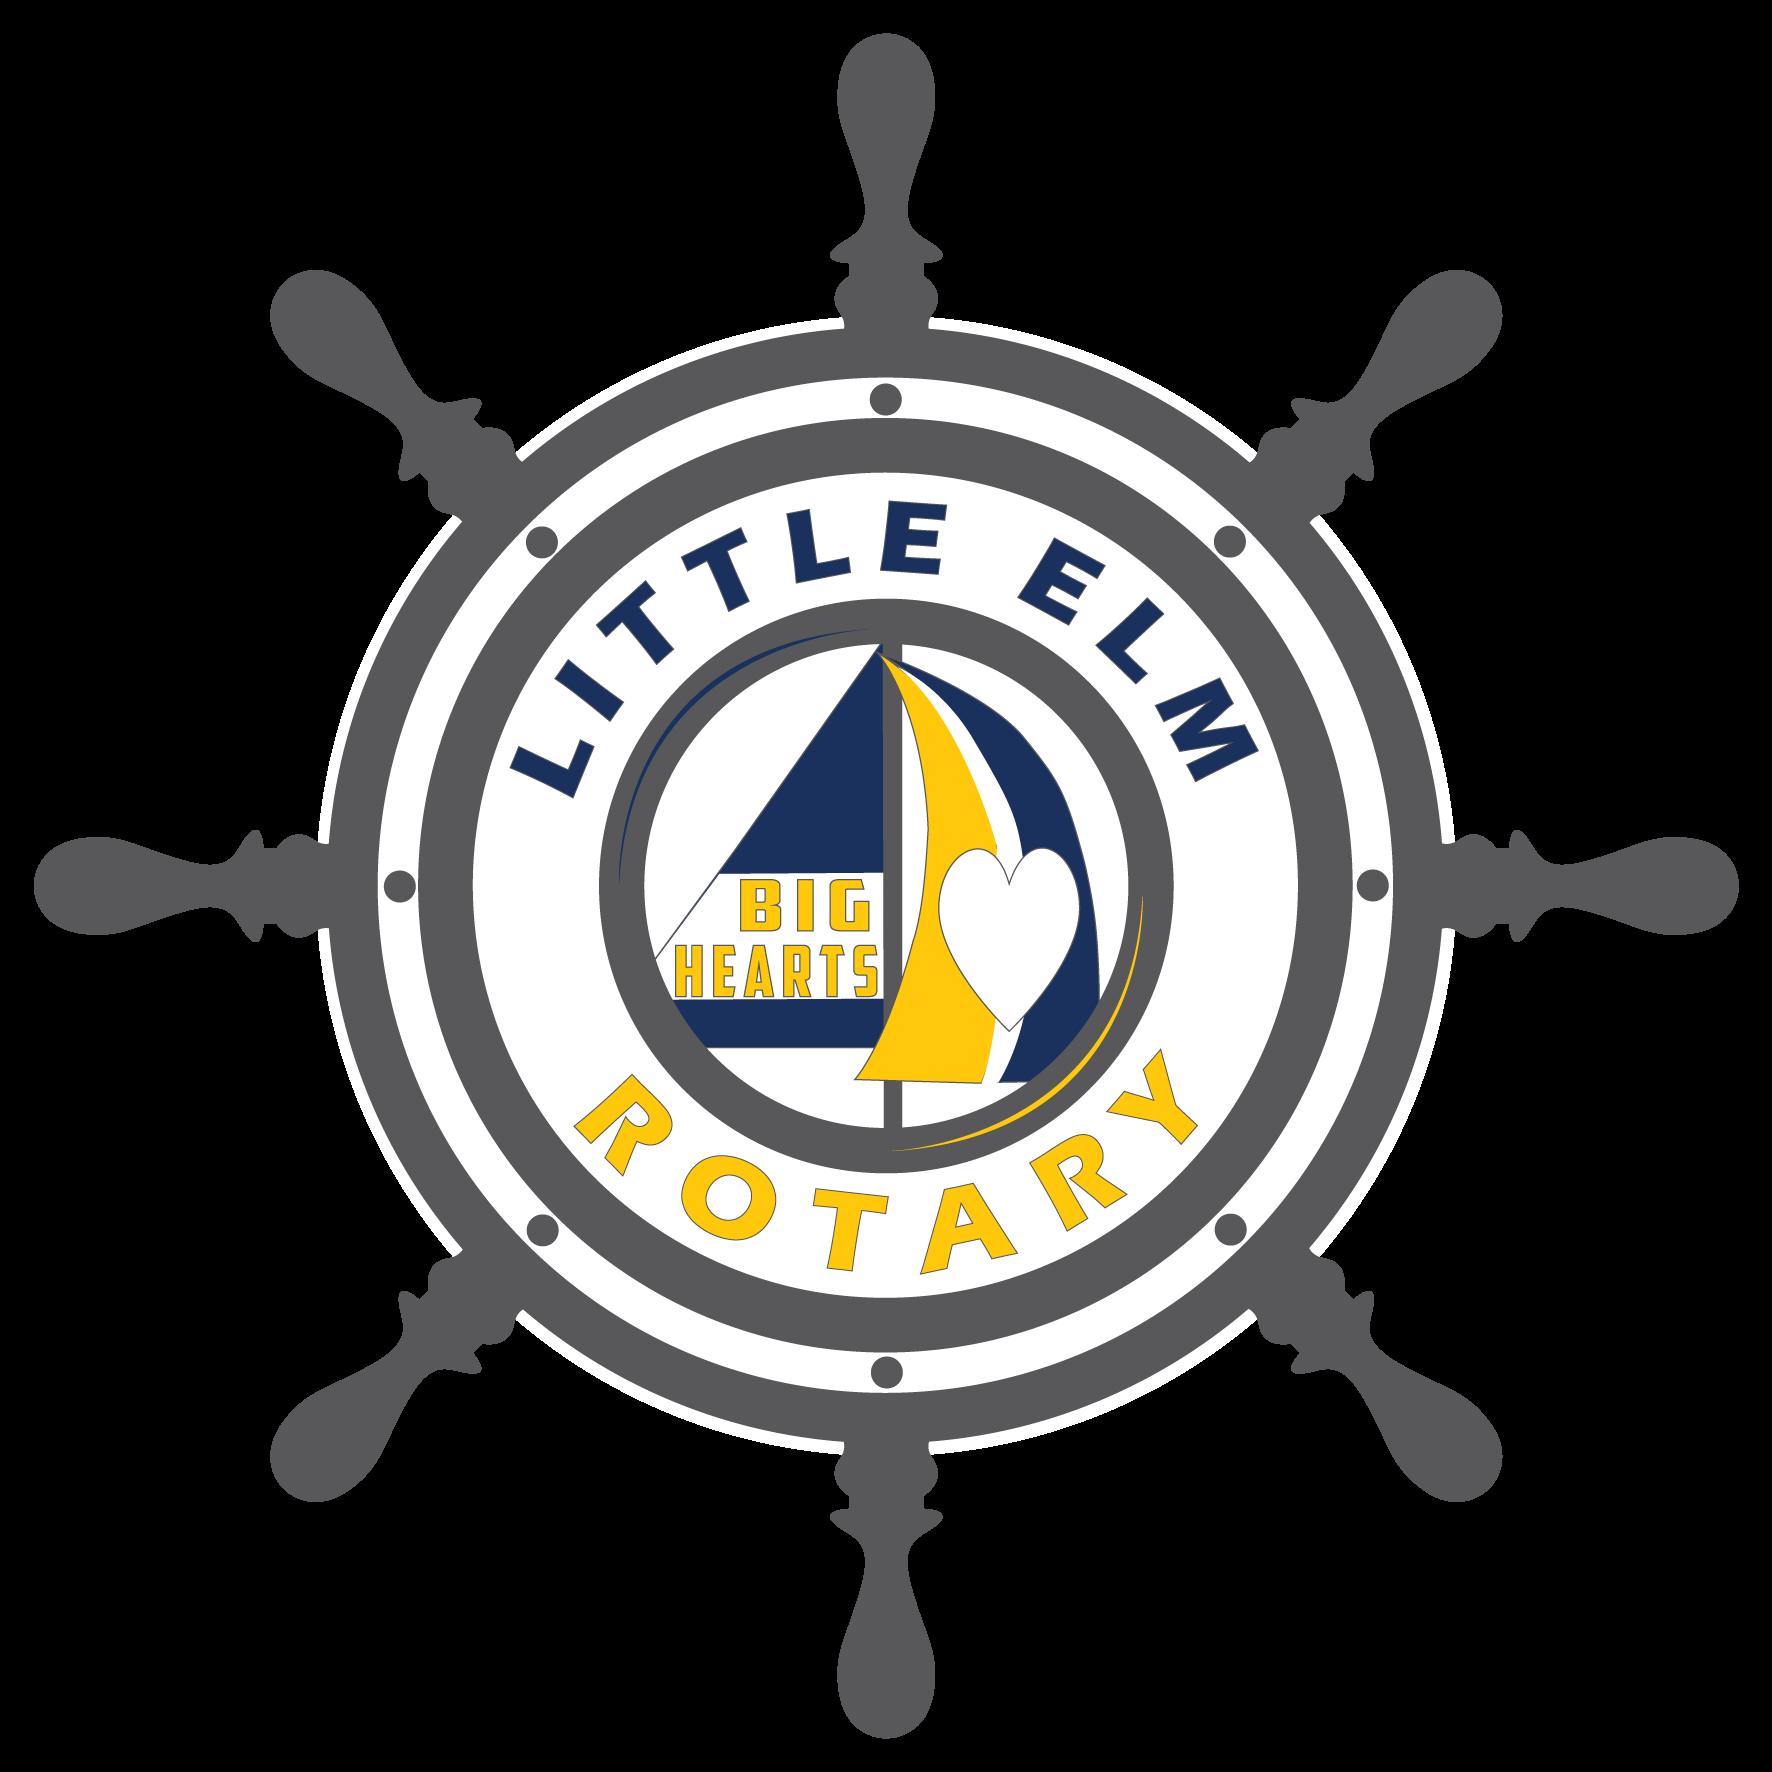 Little Elm Rotary Club Meeting